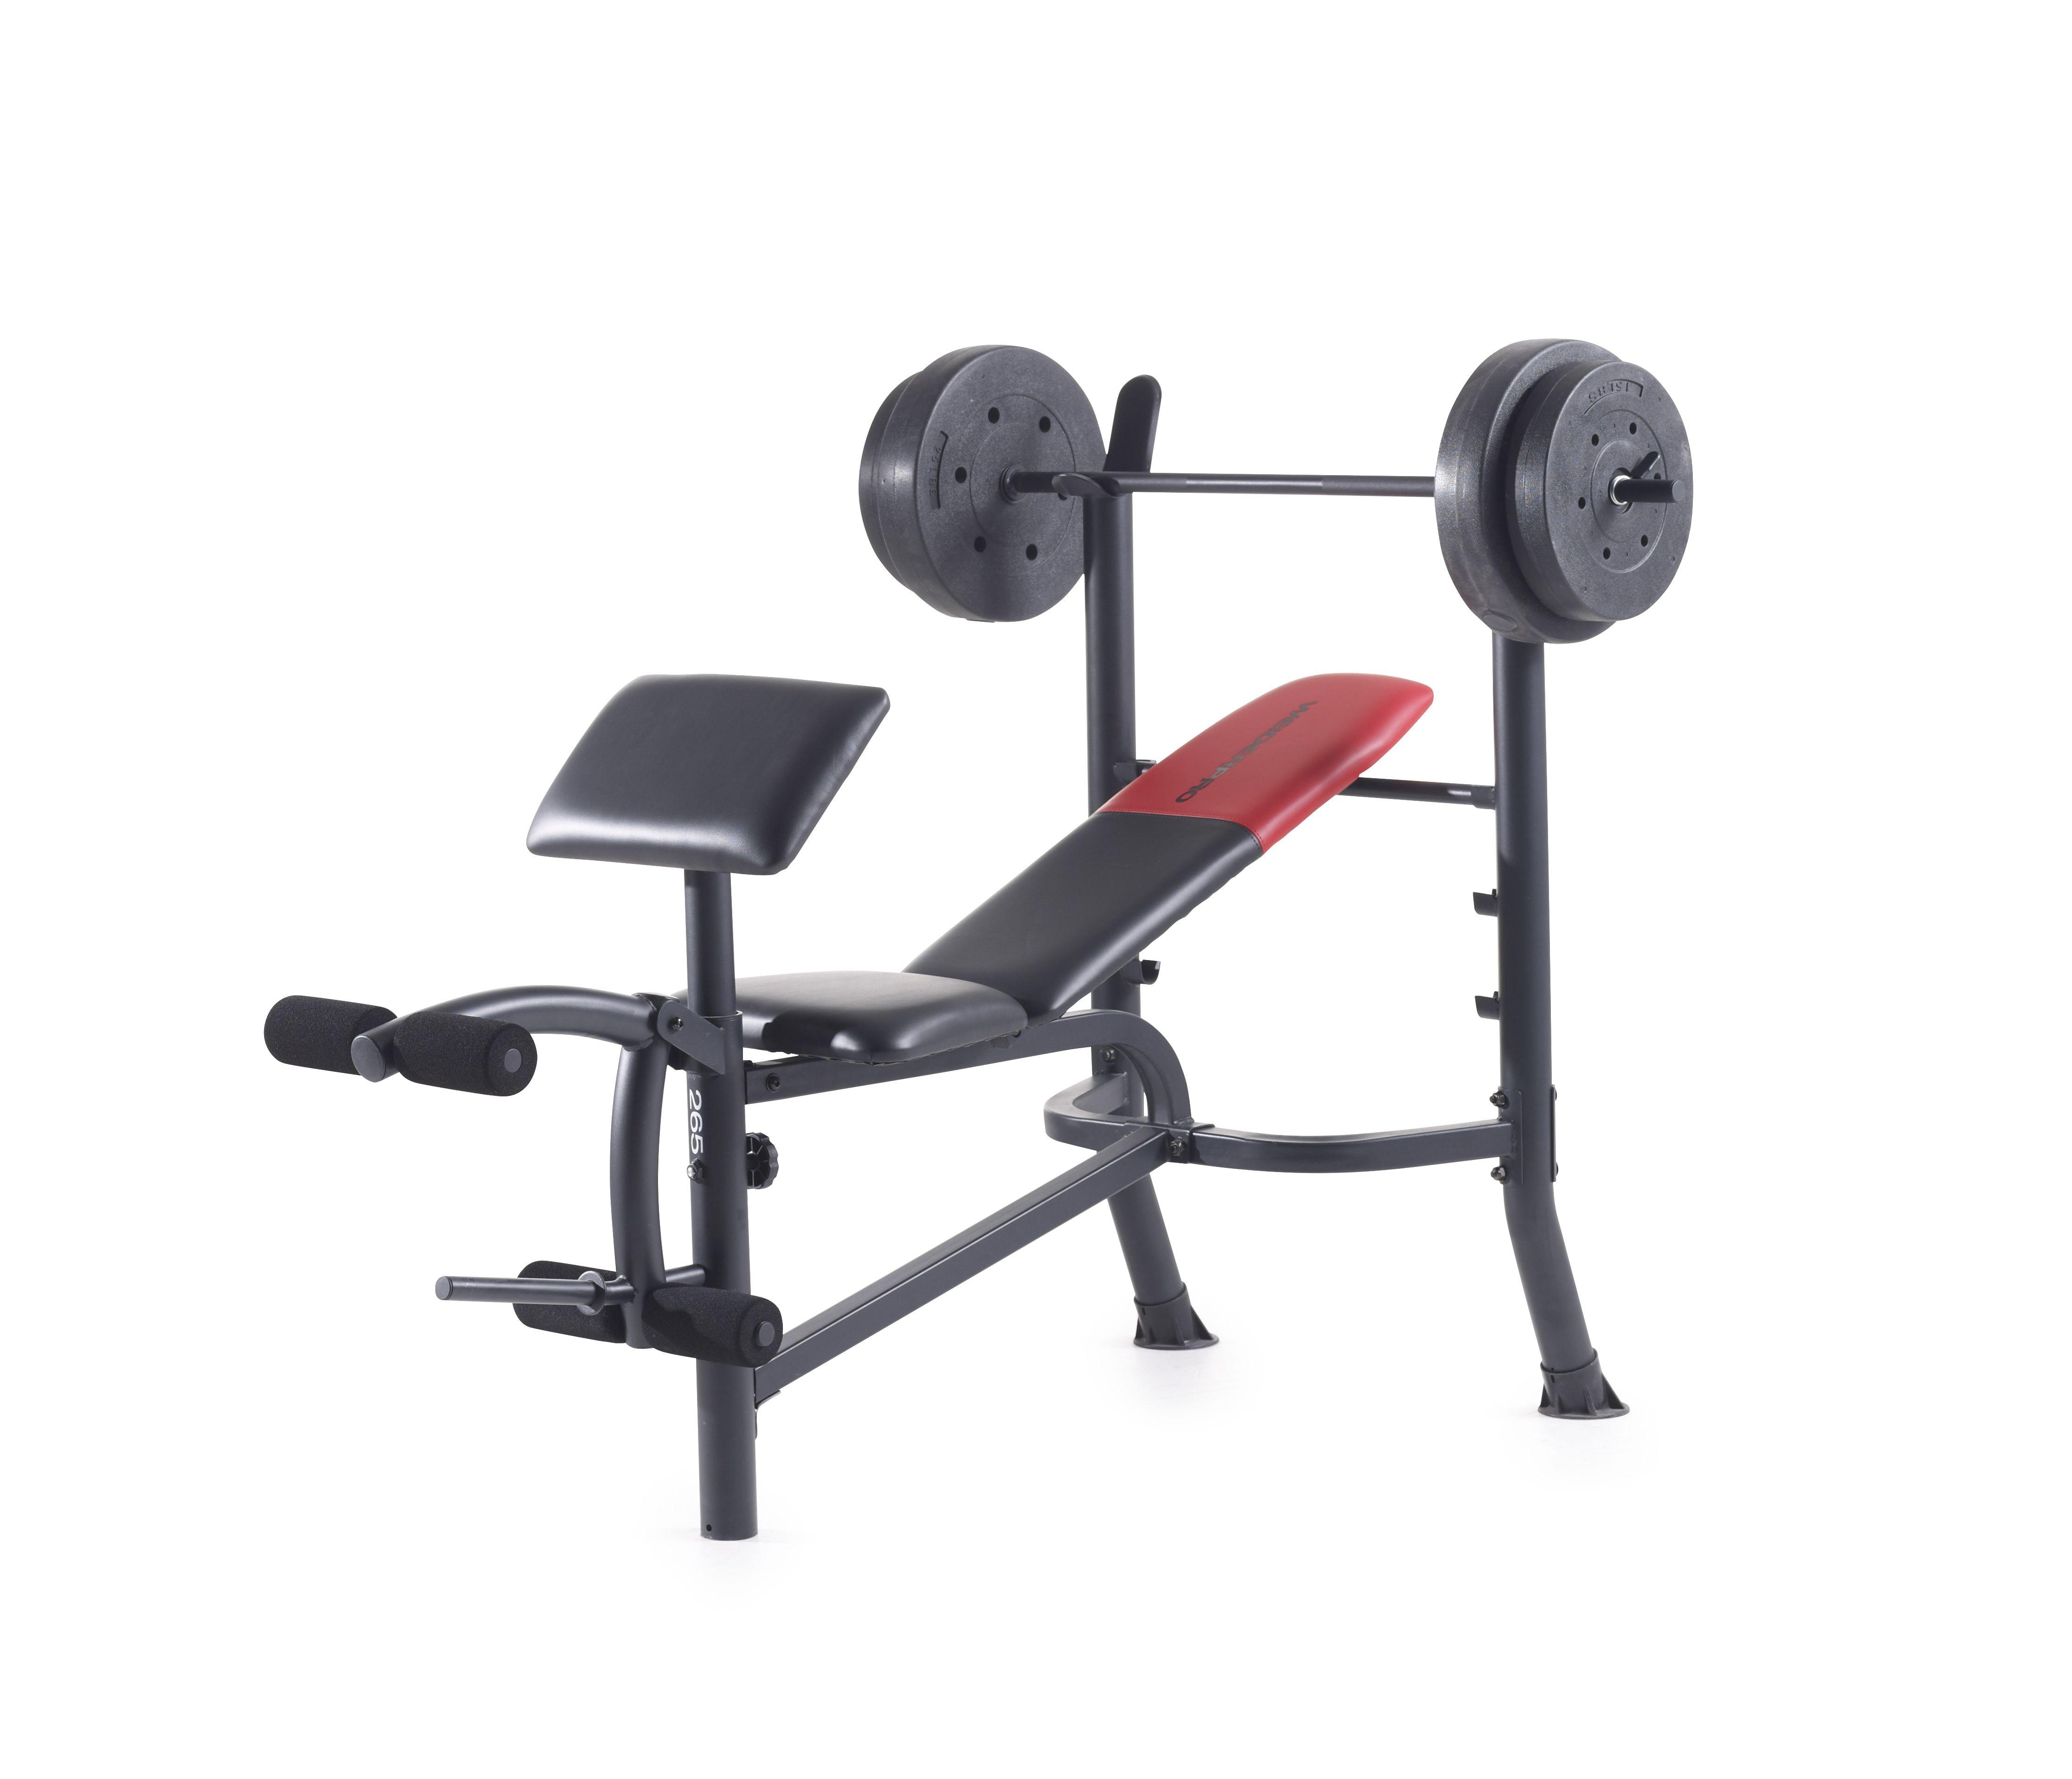 Weider Pro 265 Standard Bench With 80 Lb Vinyl Weight Set Weight Bench Set Weight Benches Home Gym Set